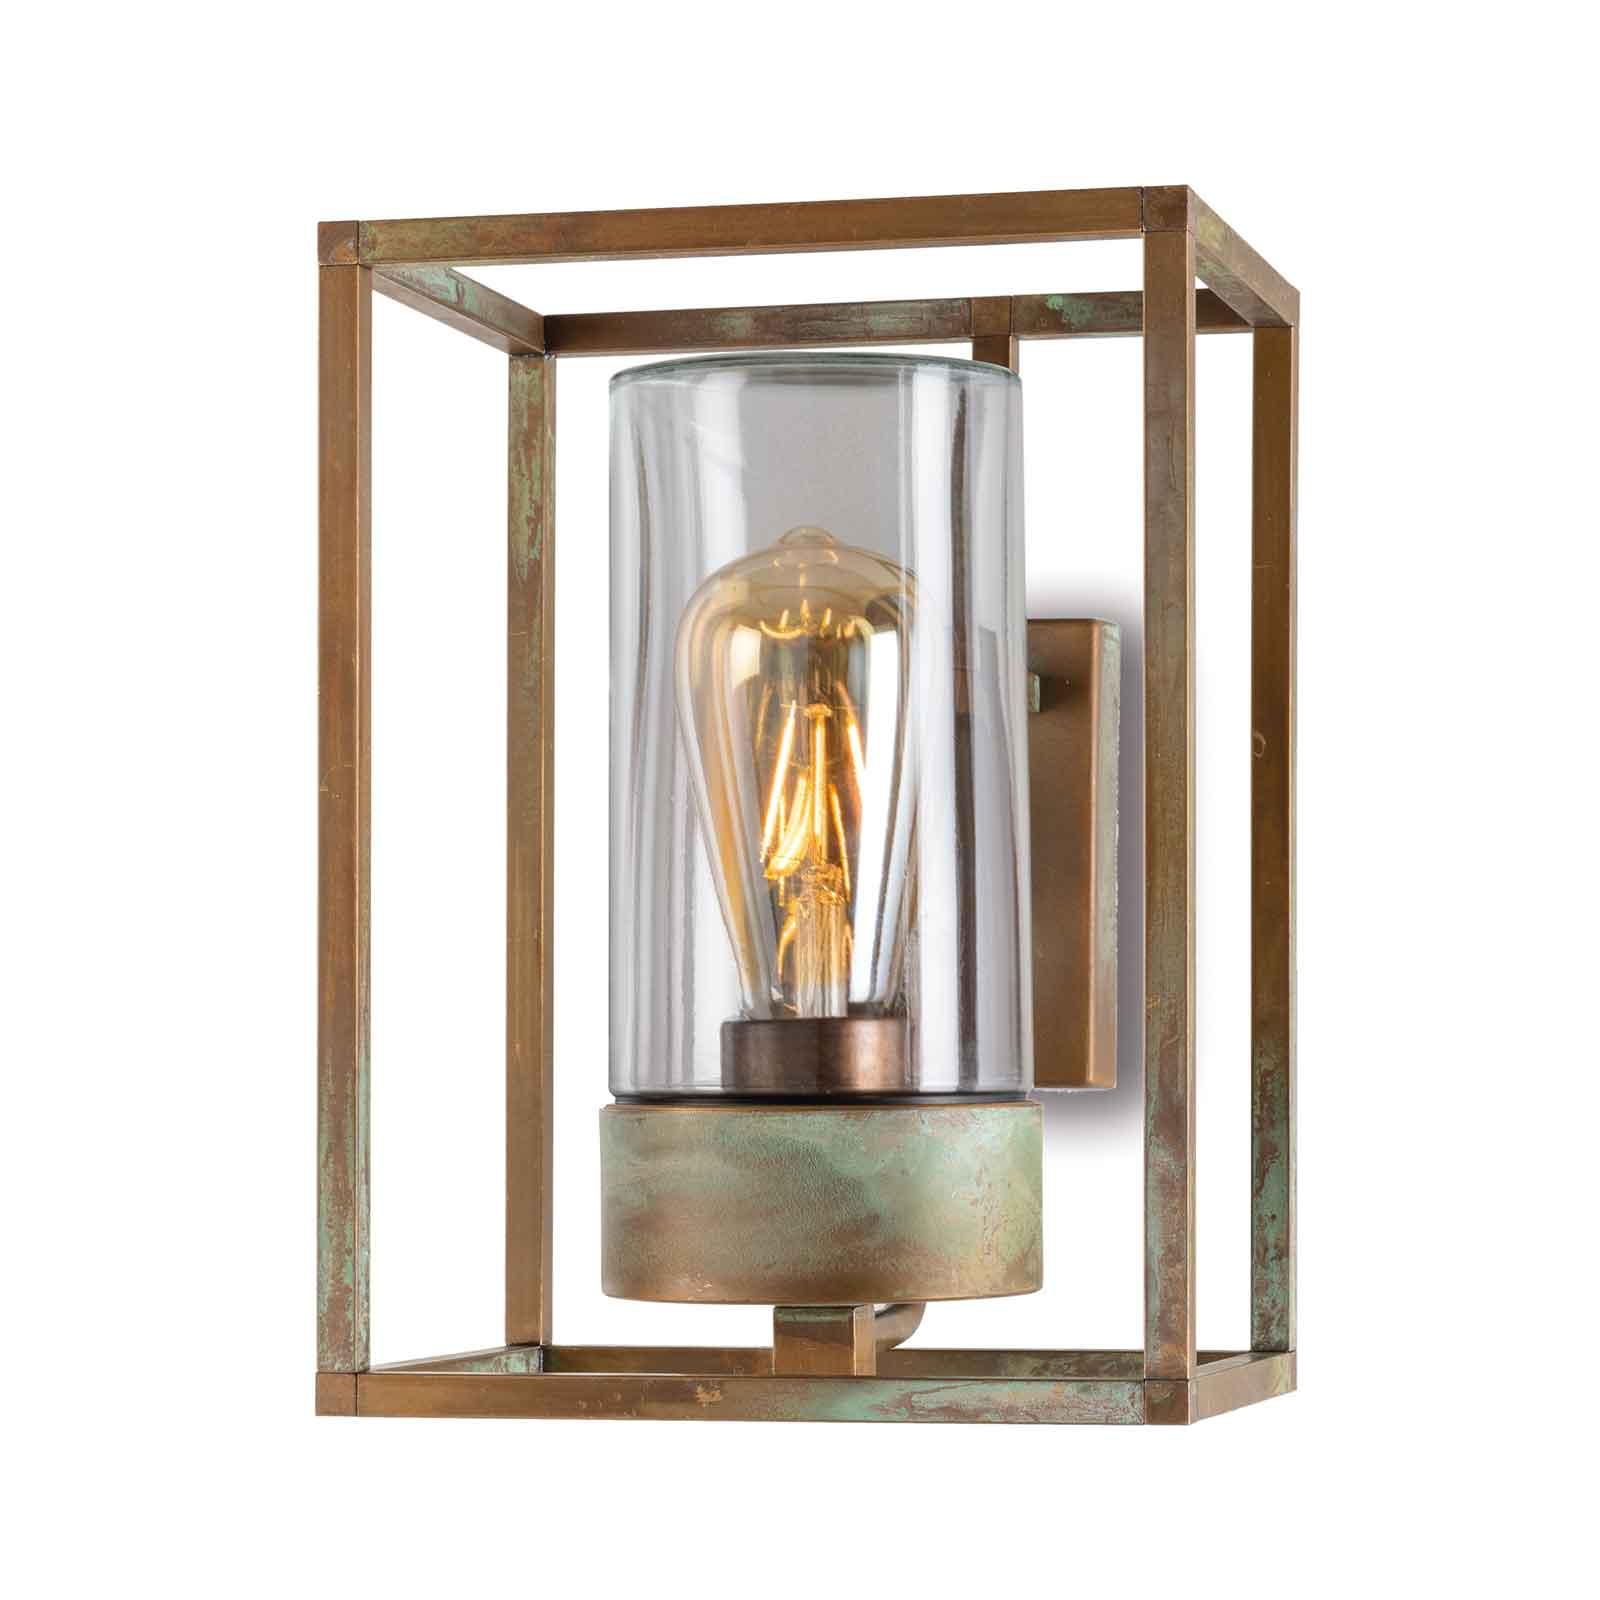 Buitenwandlamp Cubic³ 3363 messing antiek/helder